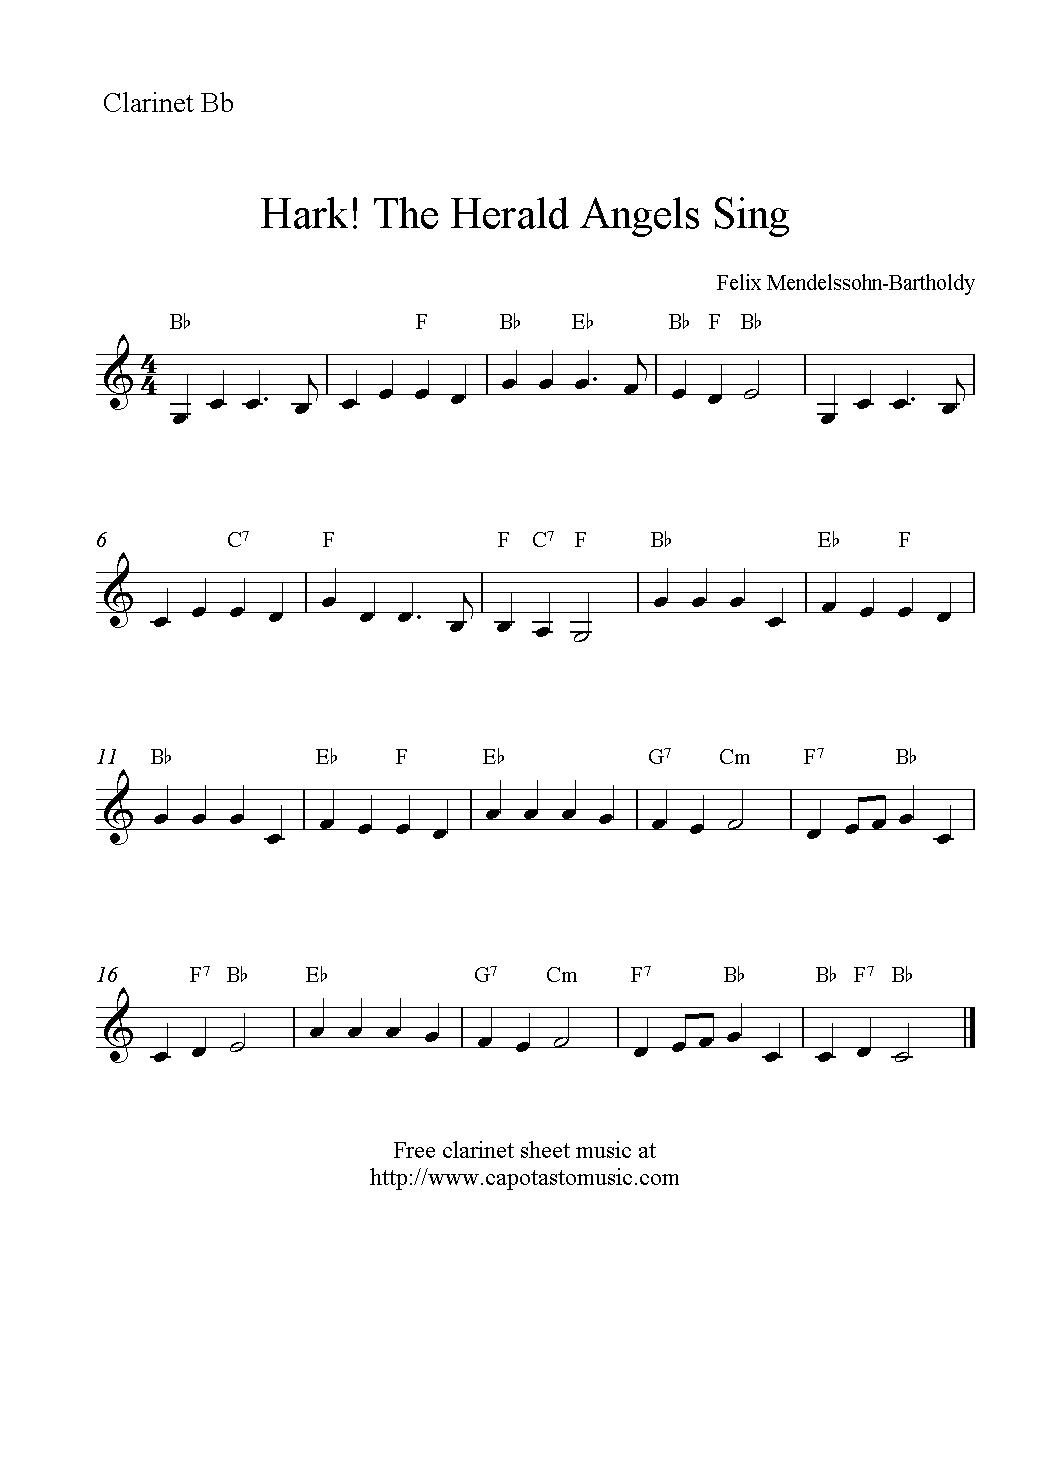 Christmas Clarinet Sheet Music Free - Google Search | Music - Free Printable Christmas Sheet Music For Clarinet